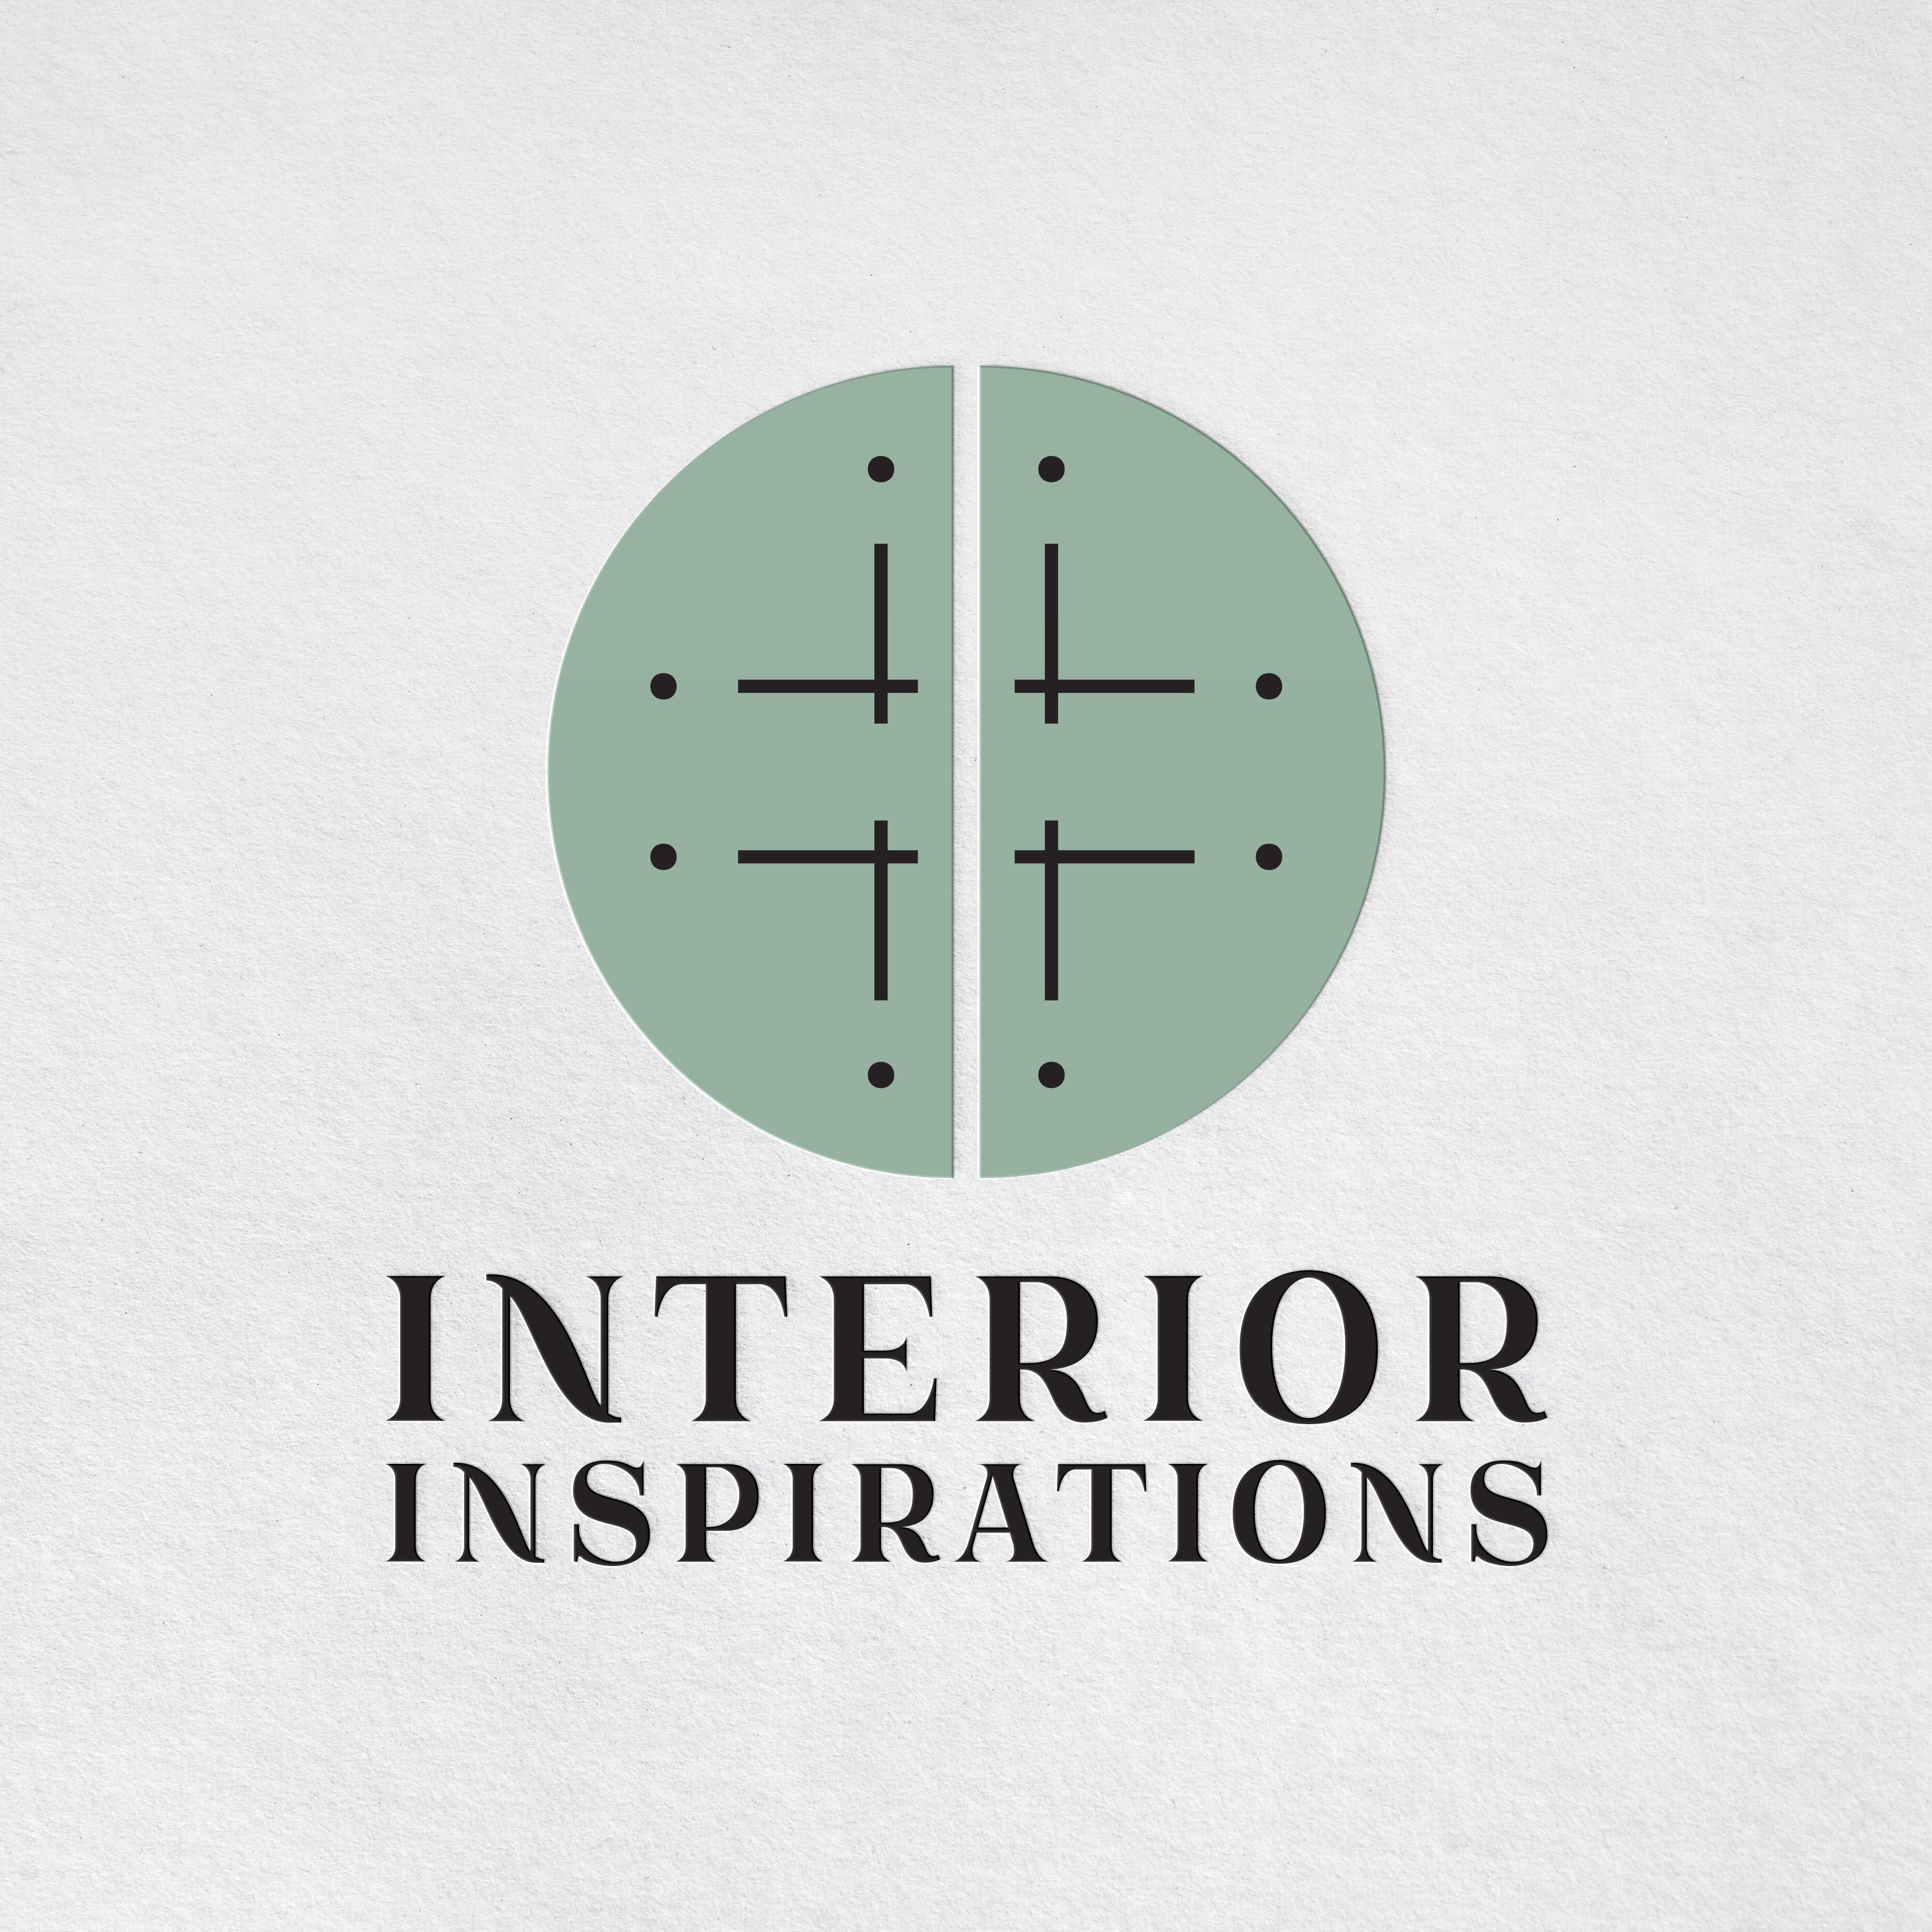 InteriorInspirations_Emboss